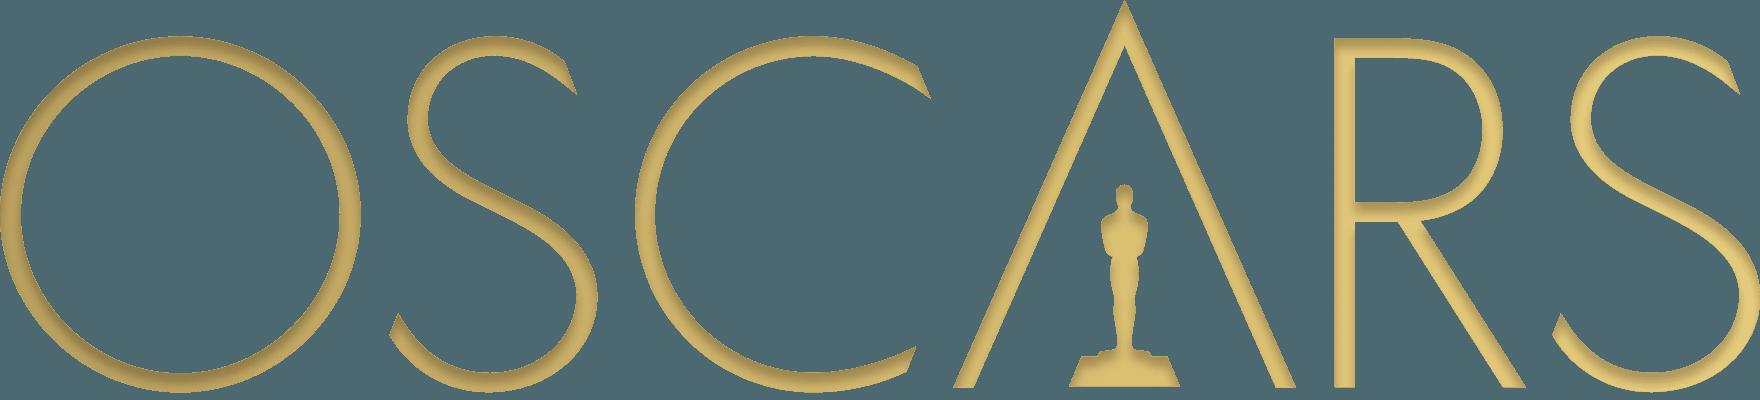 oscars logo - Google Search